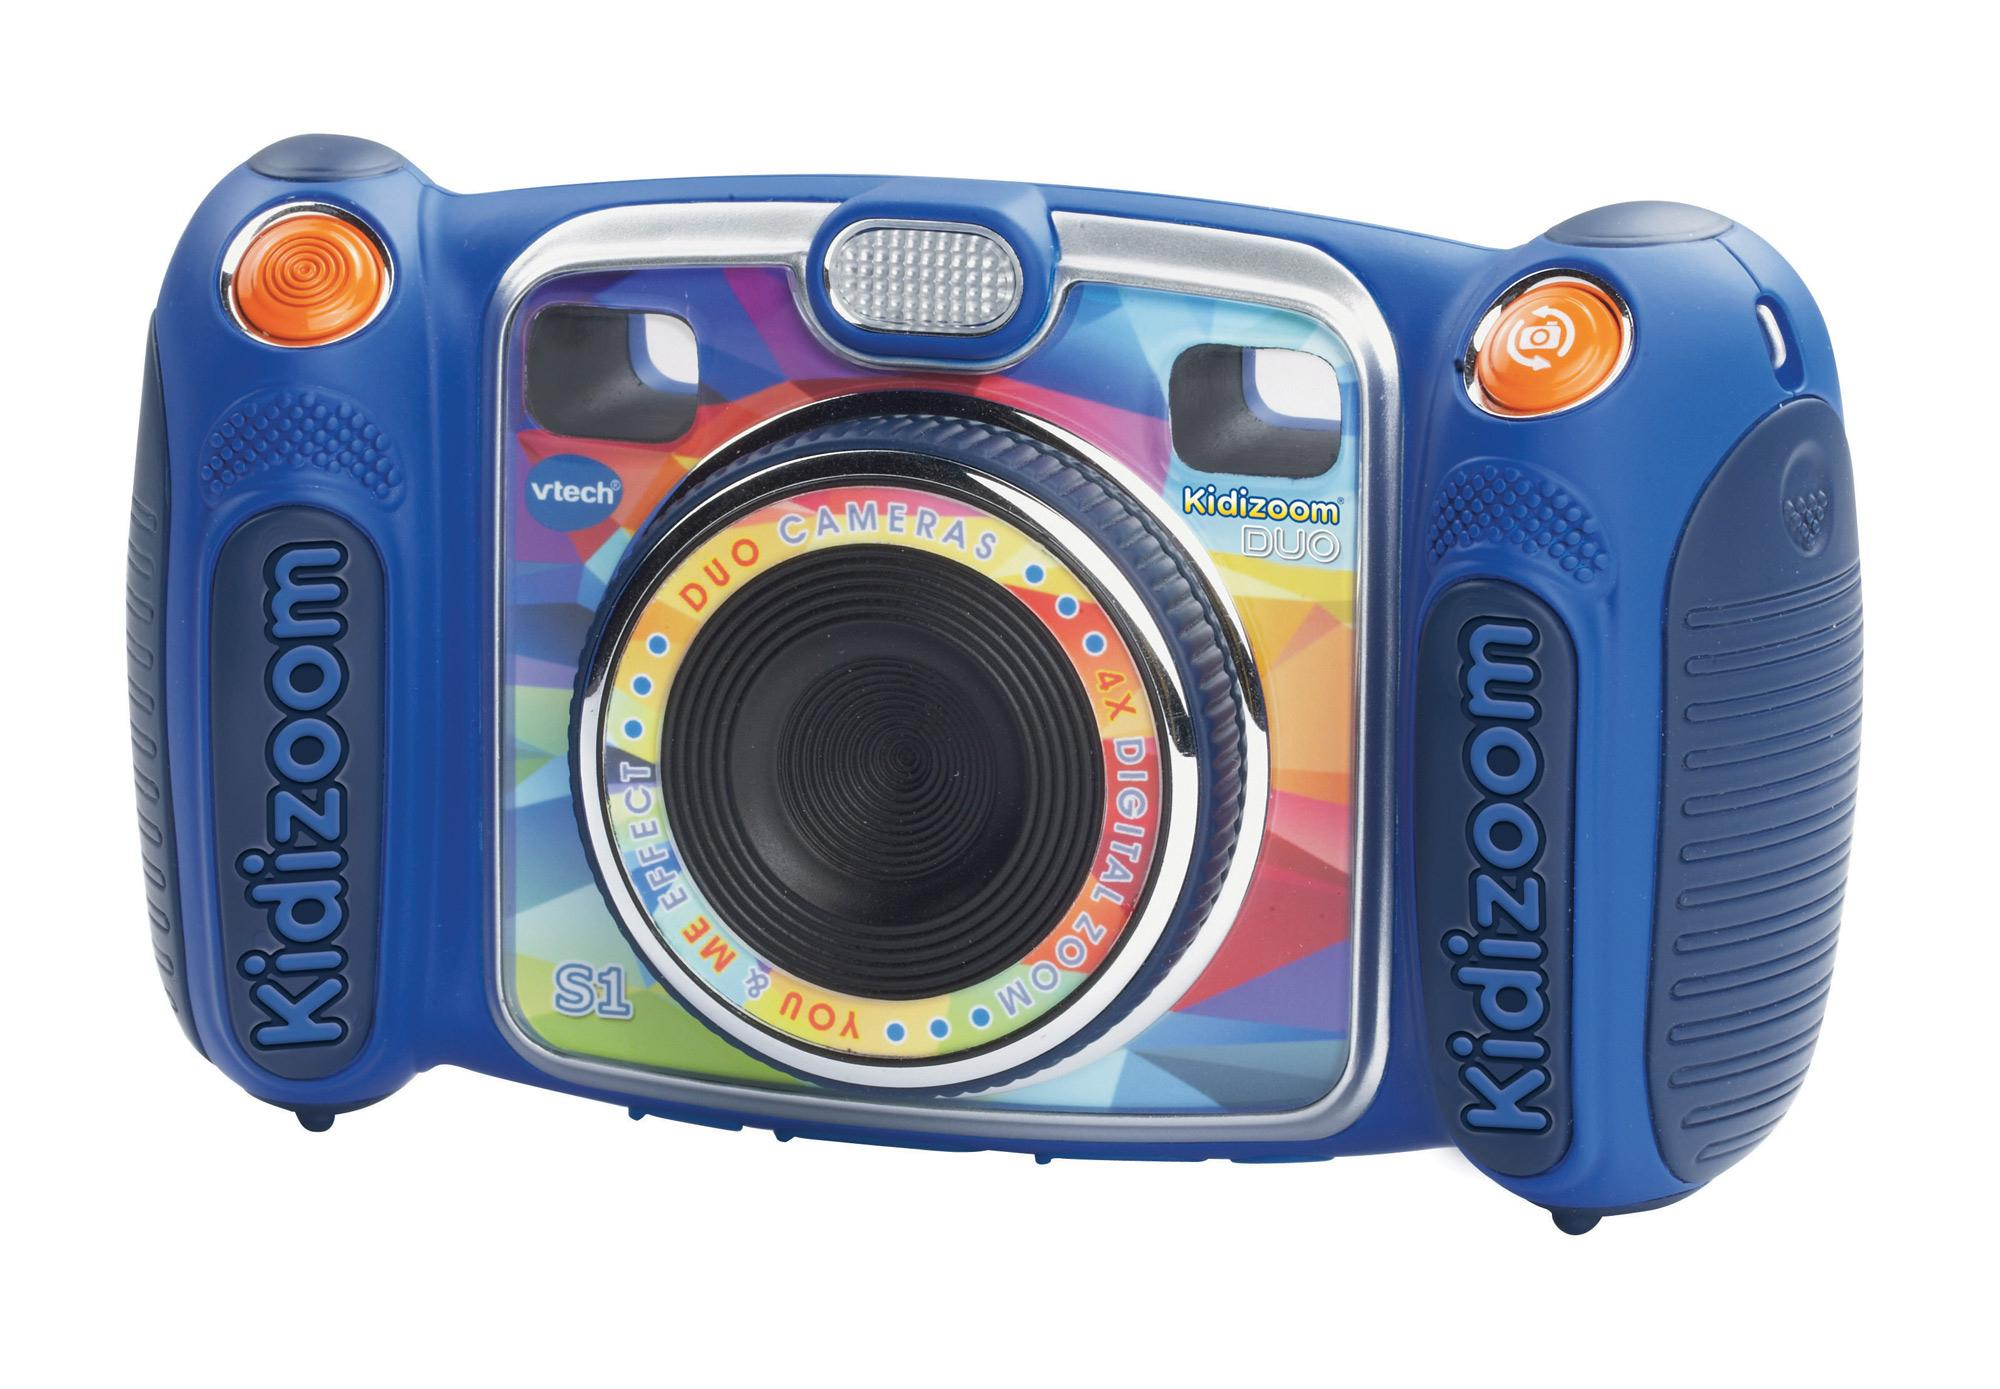 kidizoom 170803 duo digital camera blue amazon com au toys games rh amazon com au Vtech Kidizoom Camera Connect Vtech Kidizoom Camera Connect